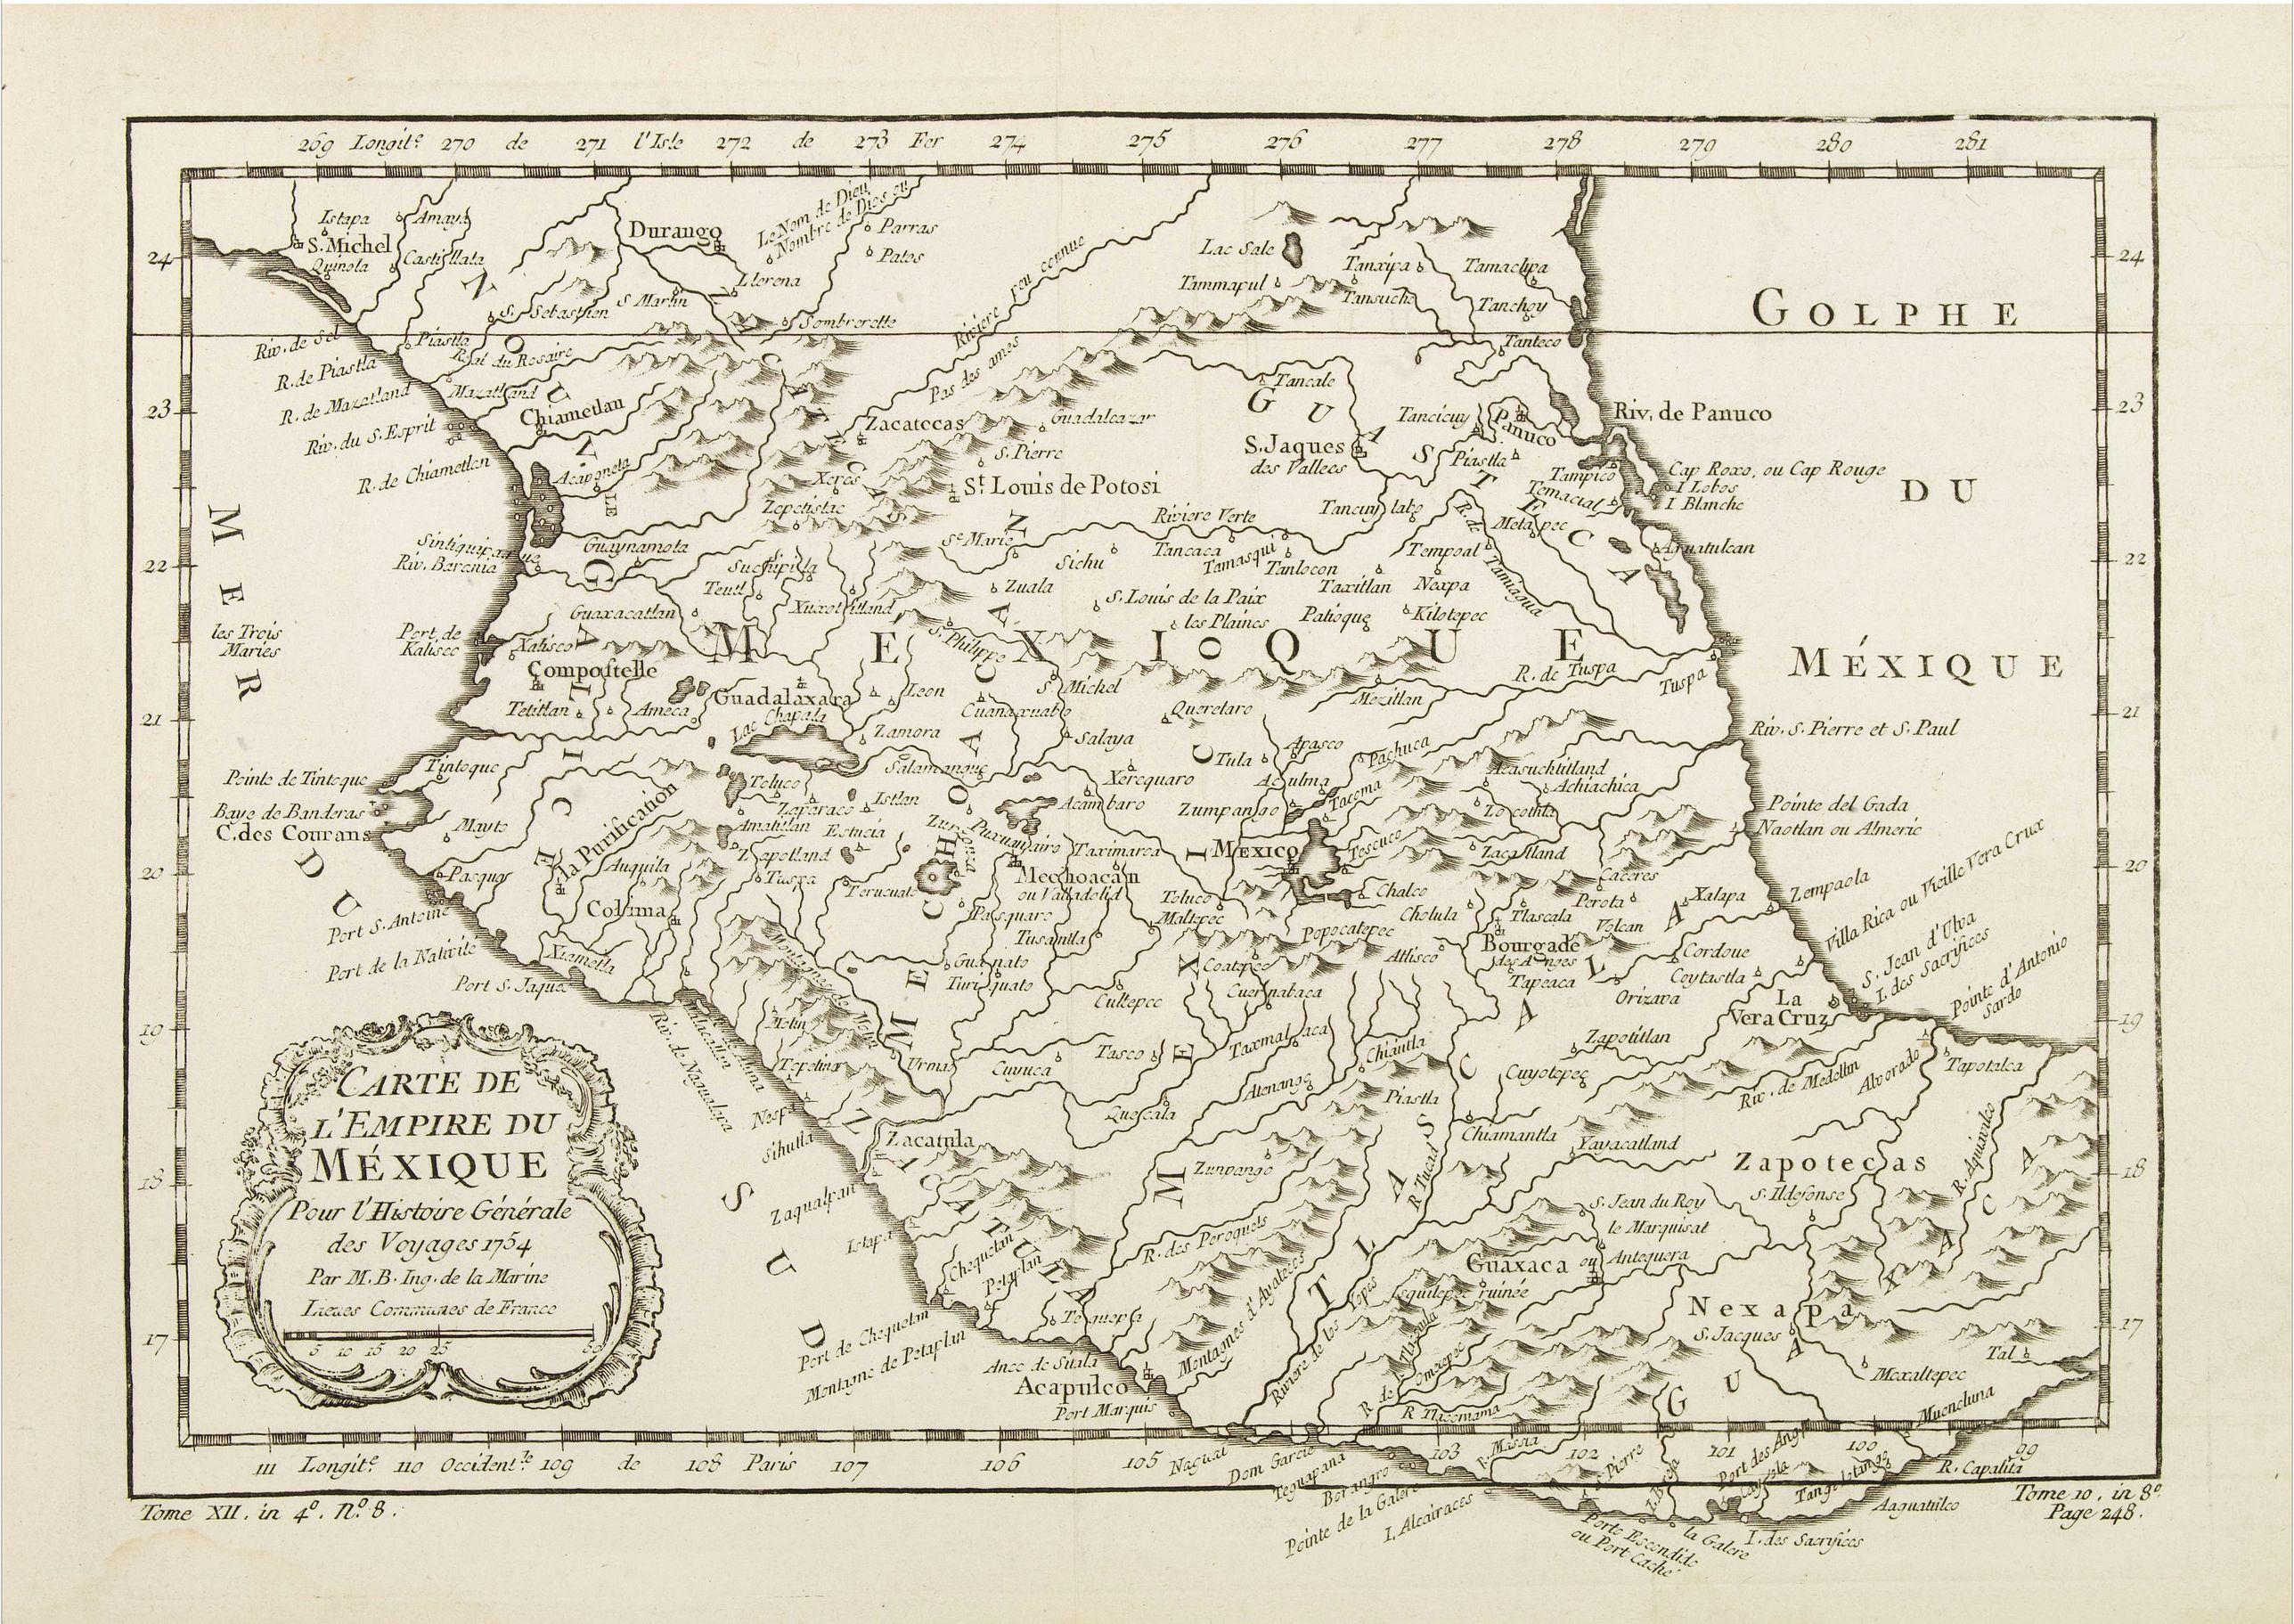 BELLIN, J.N. -  Carte de L'Empire du Mexico.